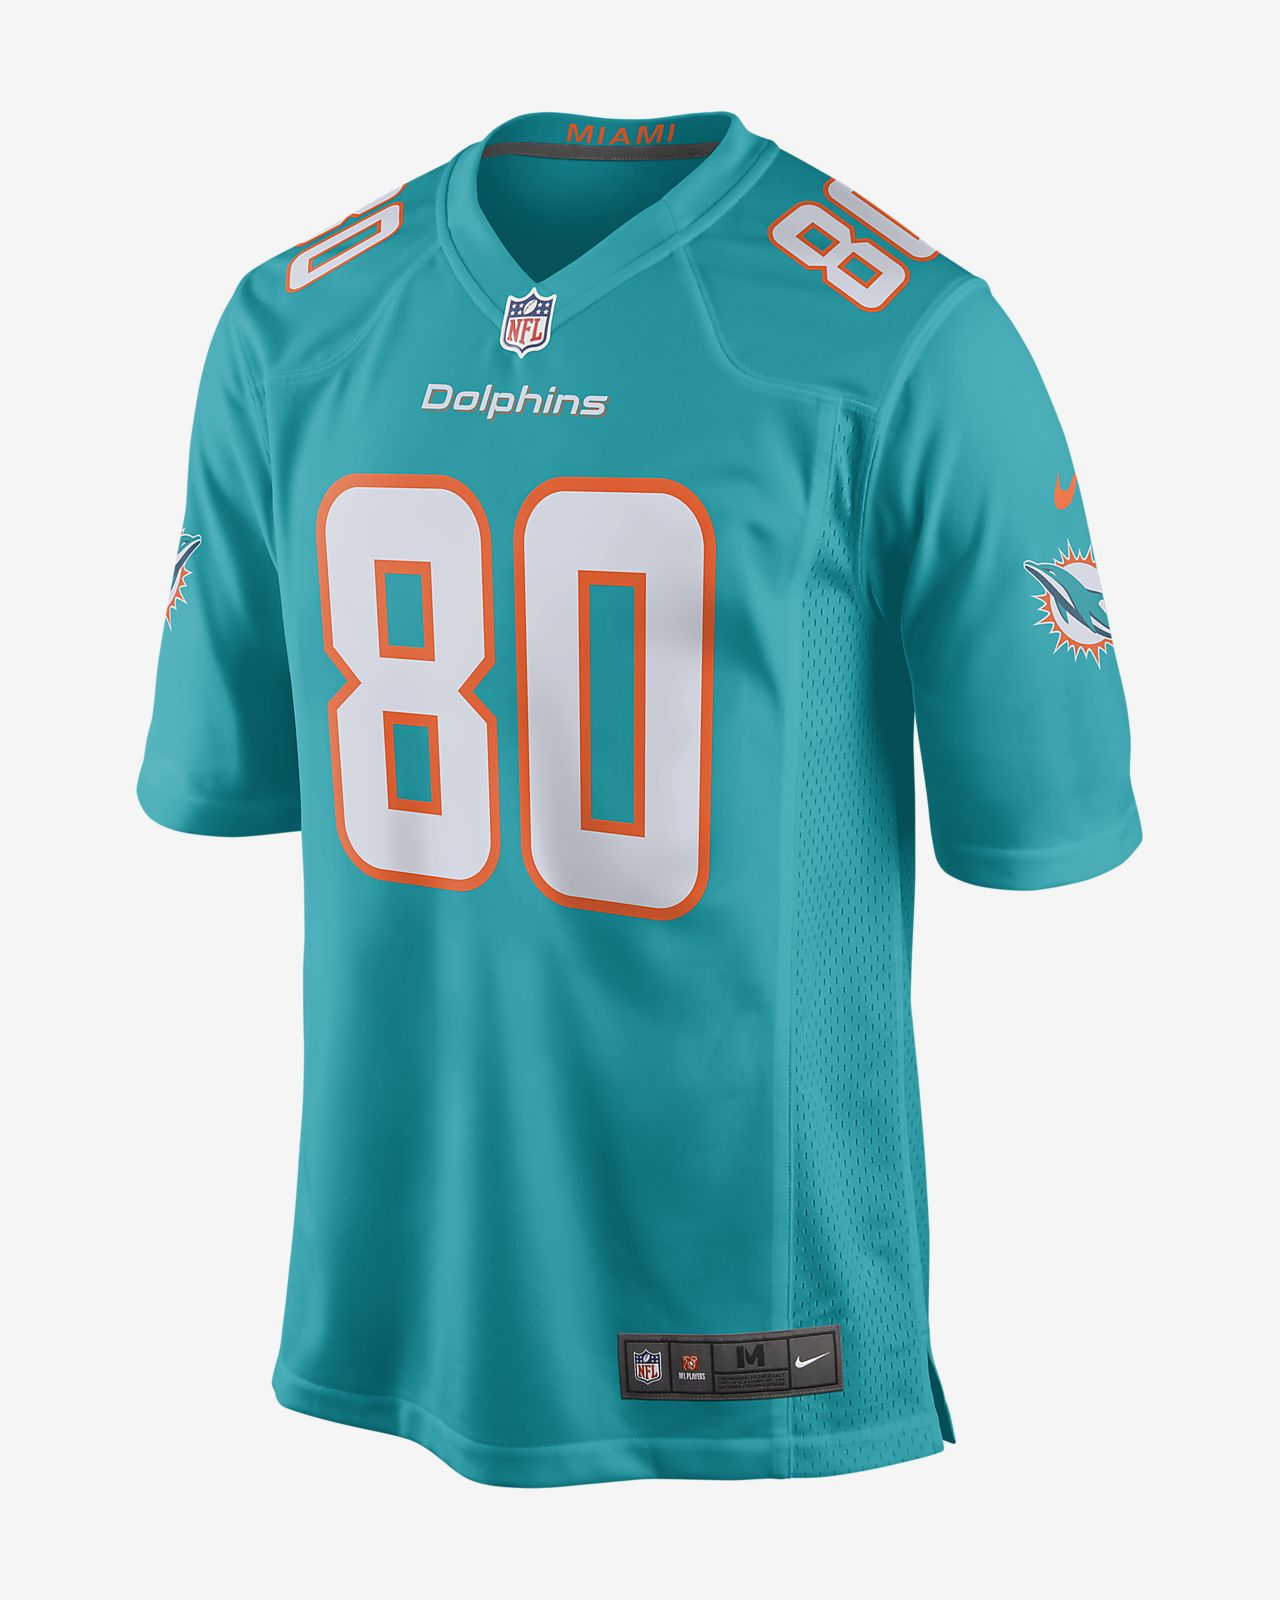 NFL Miami Dolphins (Danny Amendola) Men's Game American Football Jersey